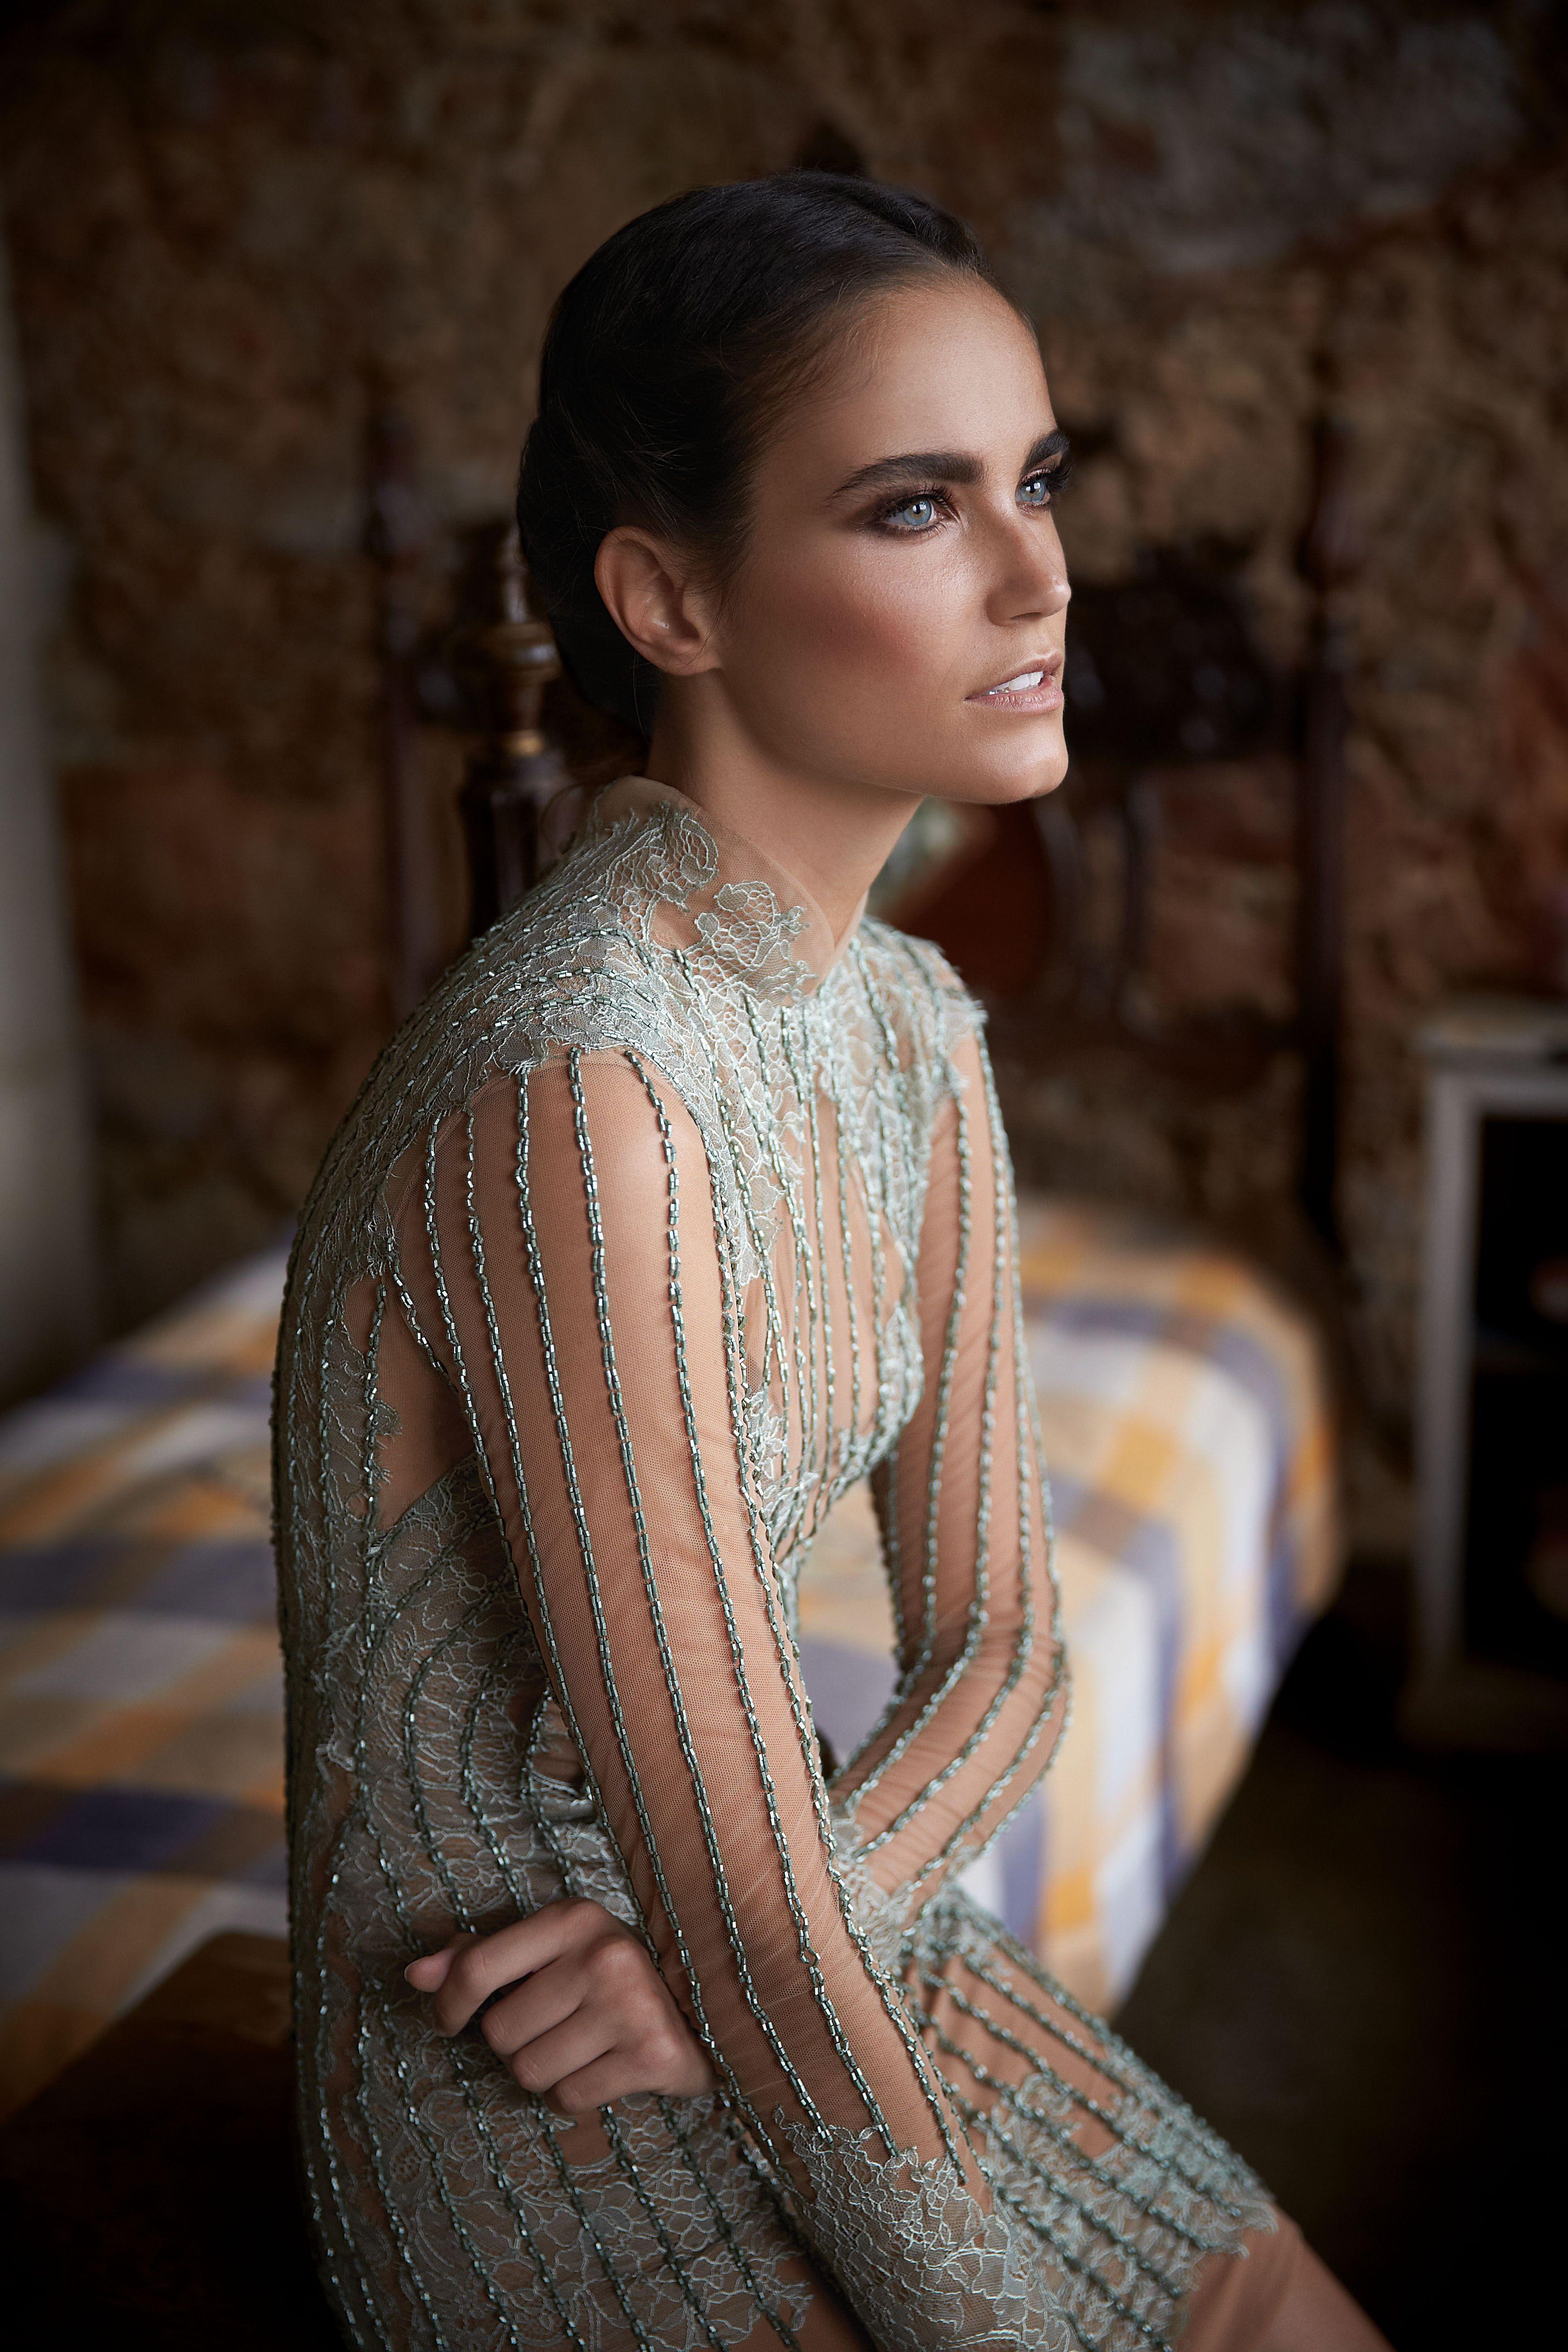 Vivaz Caminhos Reais | Beautiful Things | Pinterest | Gowns, Couture ...